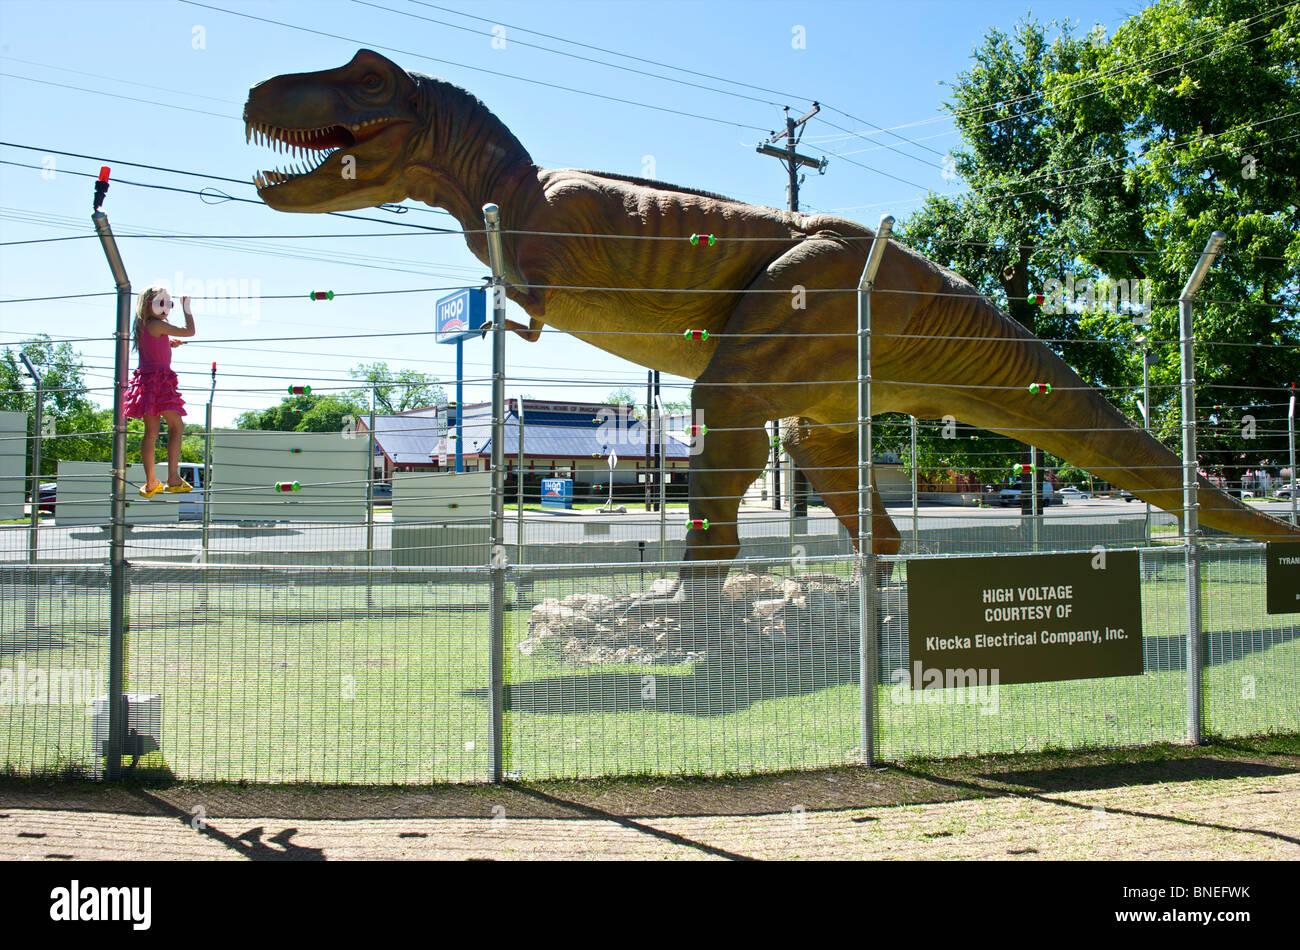 Dinosaur Sculpture Stock Photos Amp Dinosaur Sculpture Stock